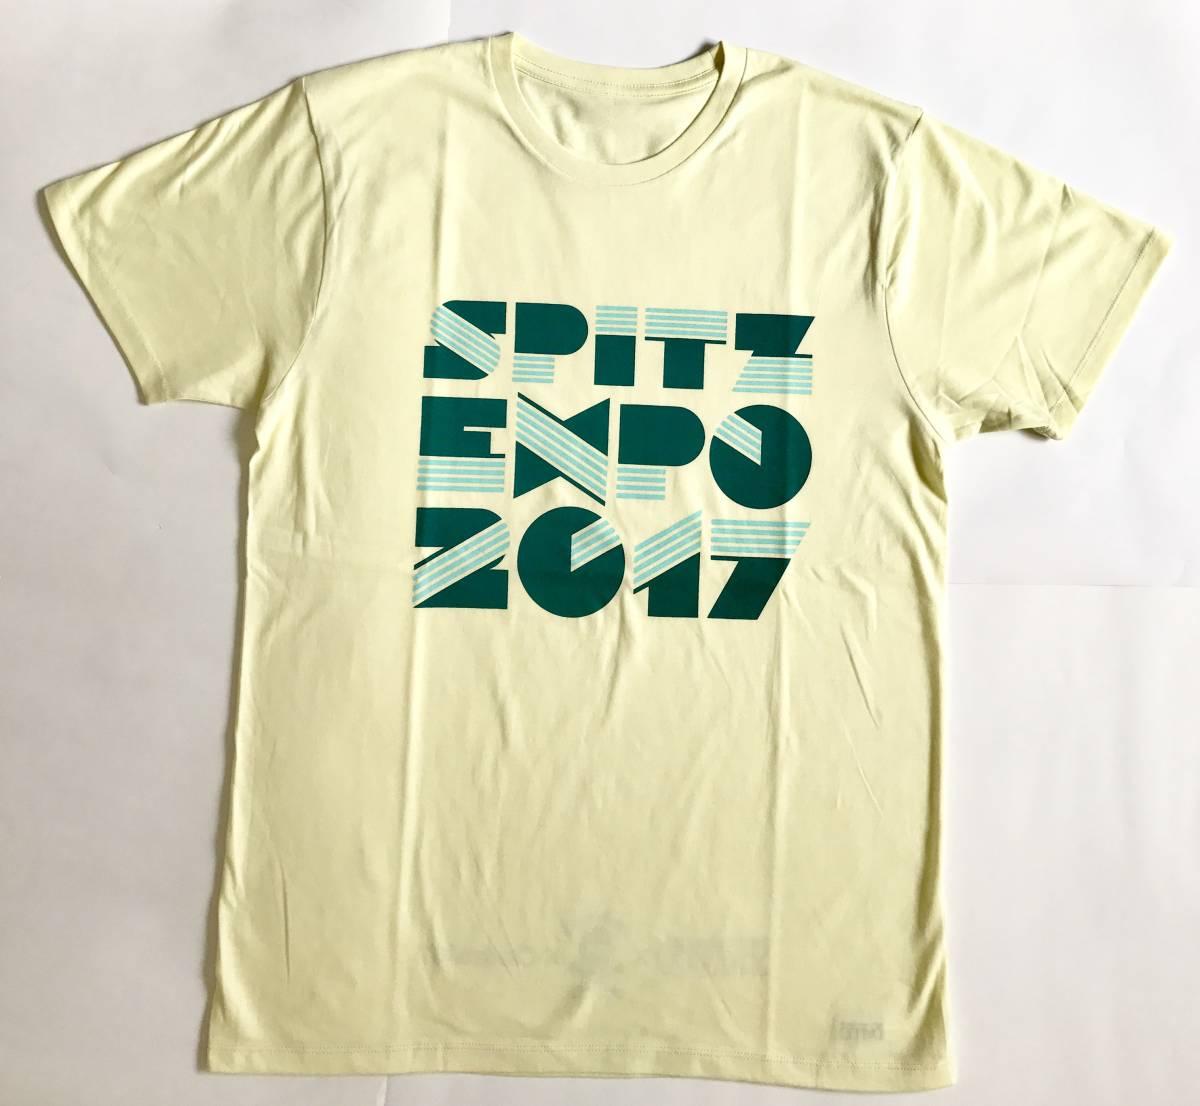 SPITZEXPO2017 グッズ Tシャツ イエロー L SPITZ 30th × ロックロックこんにちは!× Central67 / スピッツ / スピッツエキスポ